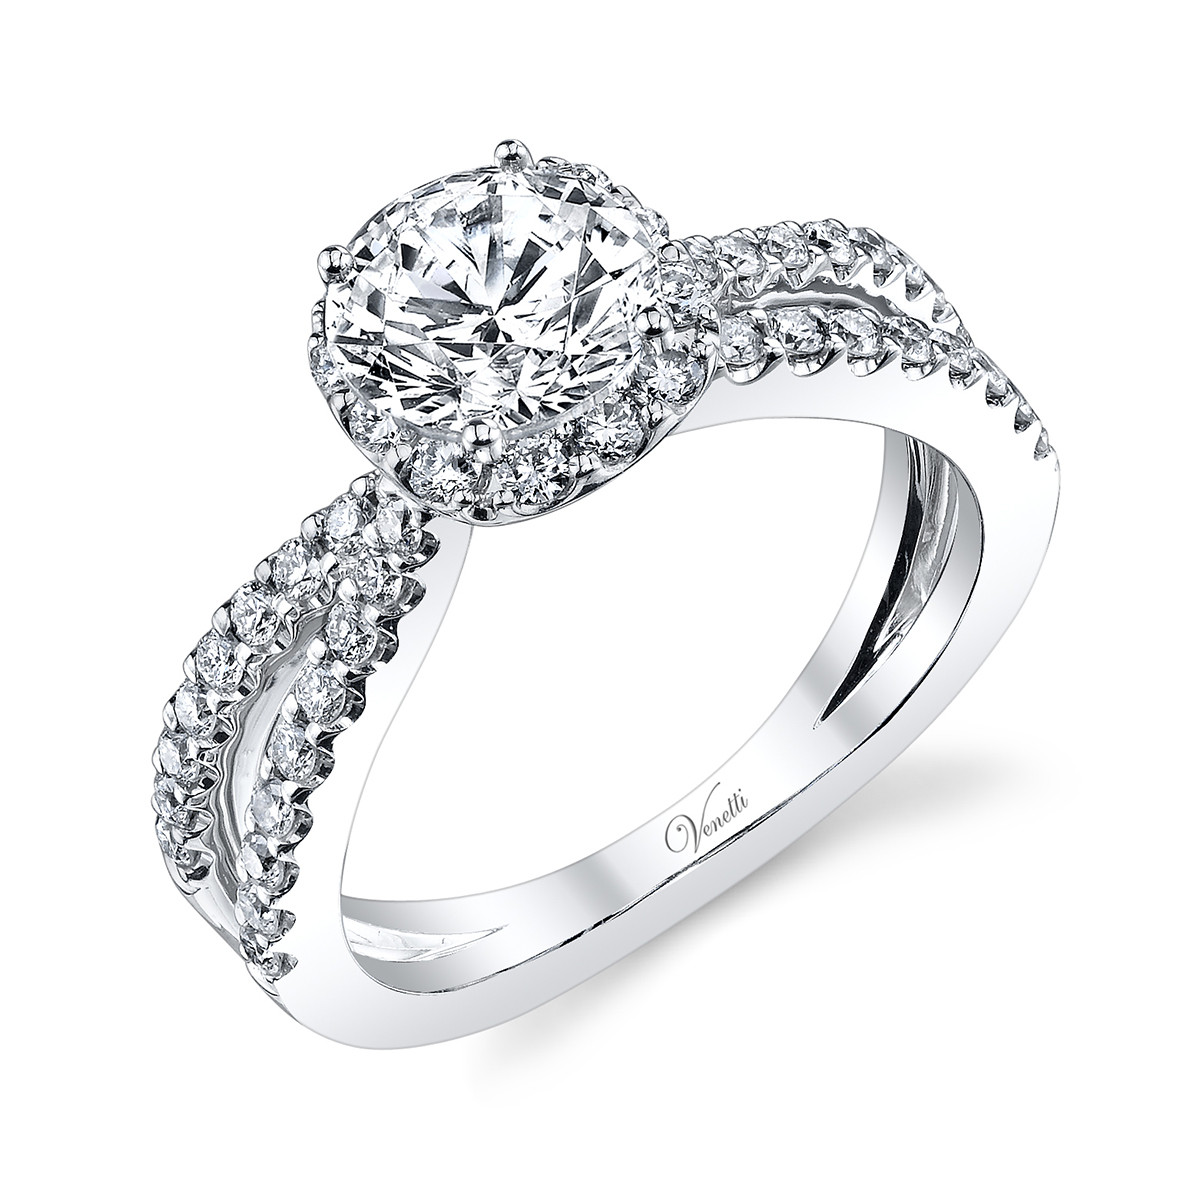 New Venetti 0.70 CTW Diamond Engagement Ring Setting